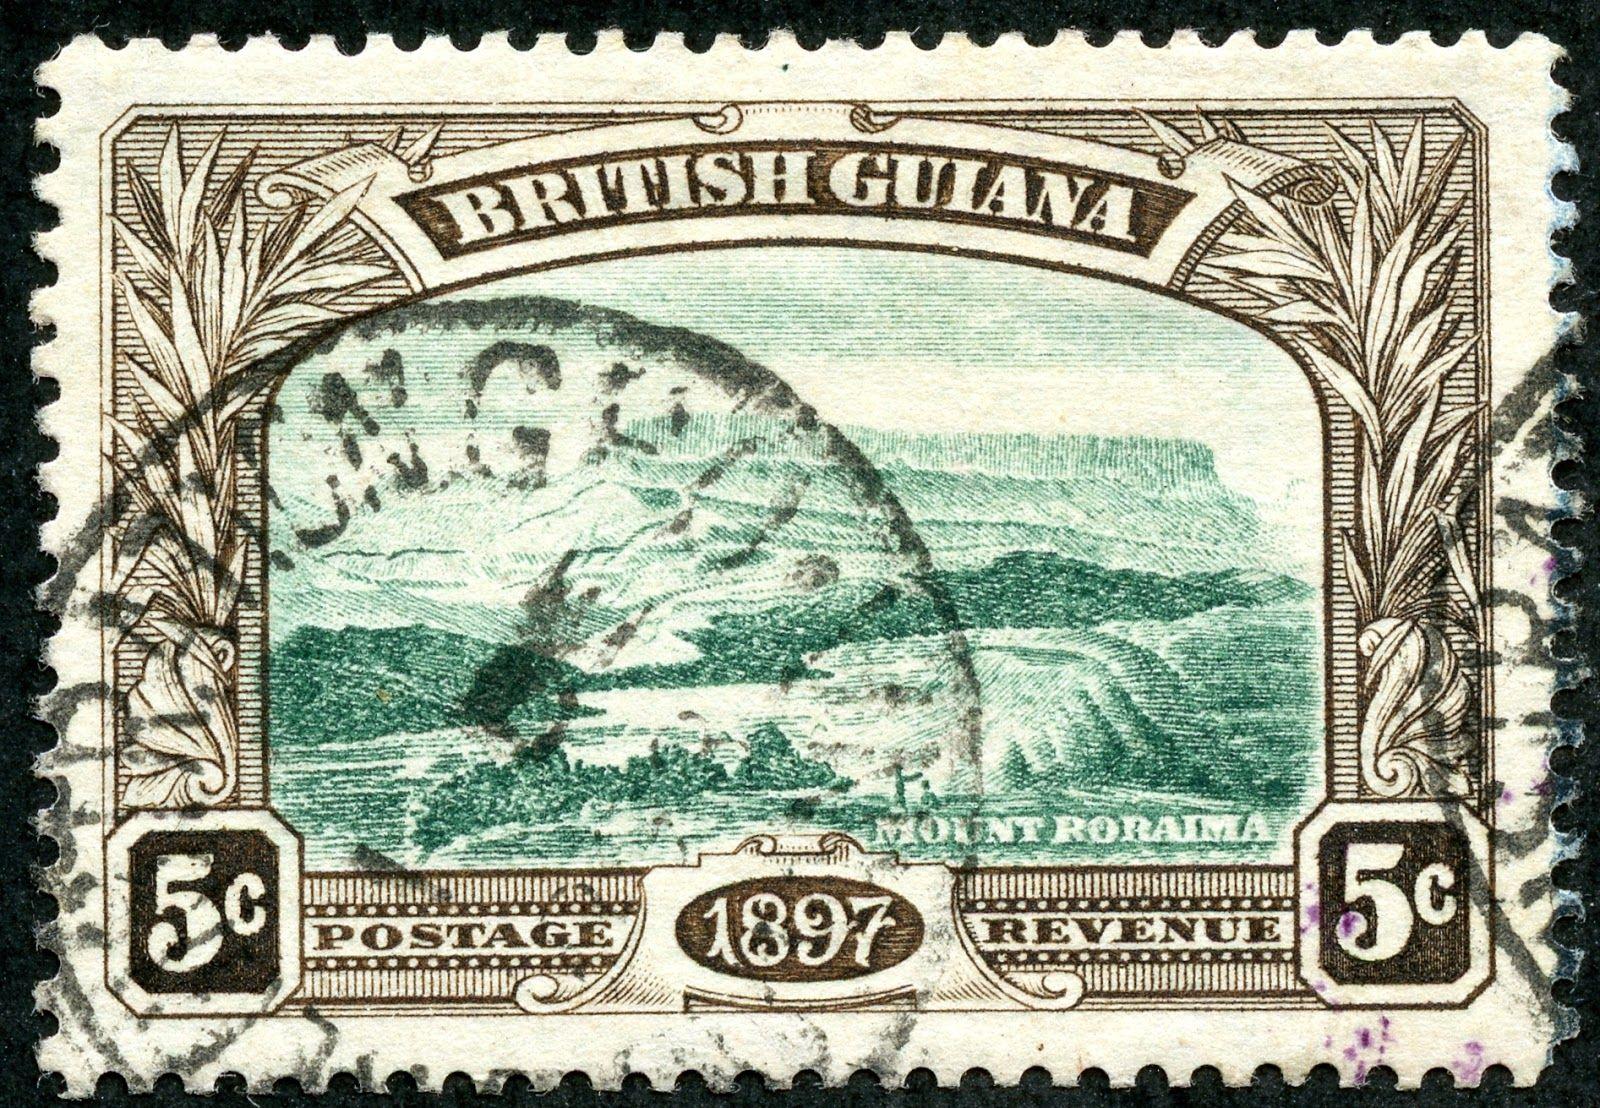 British guiana 1898 scott 154 5c brown green mt